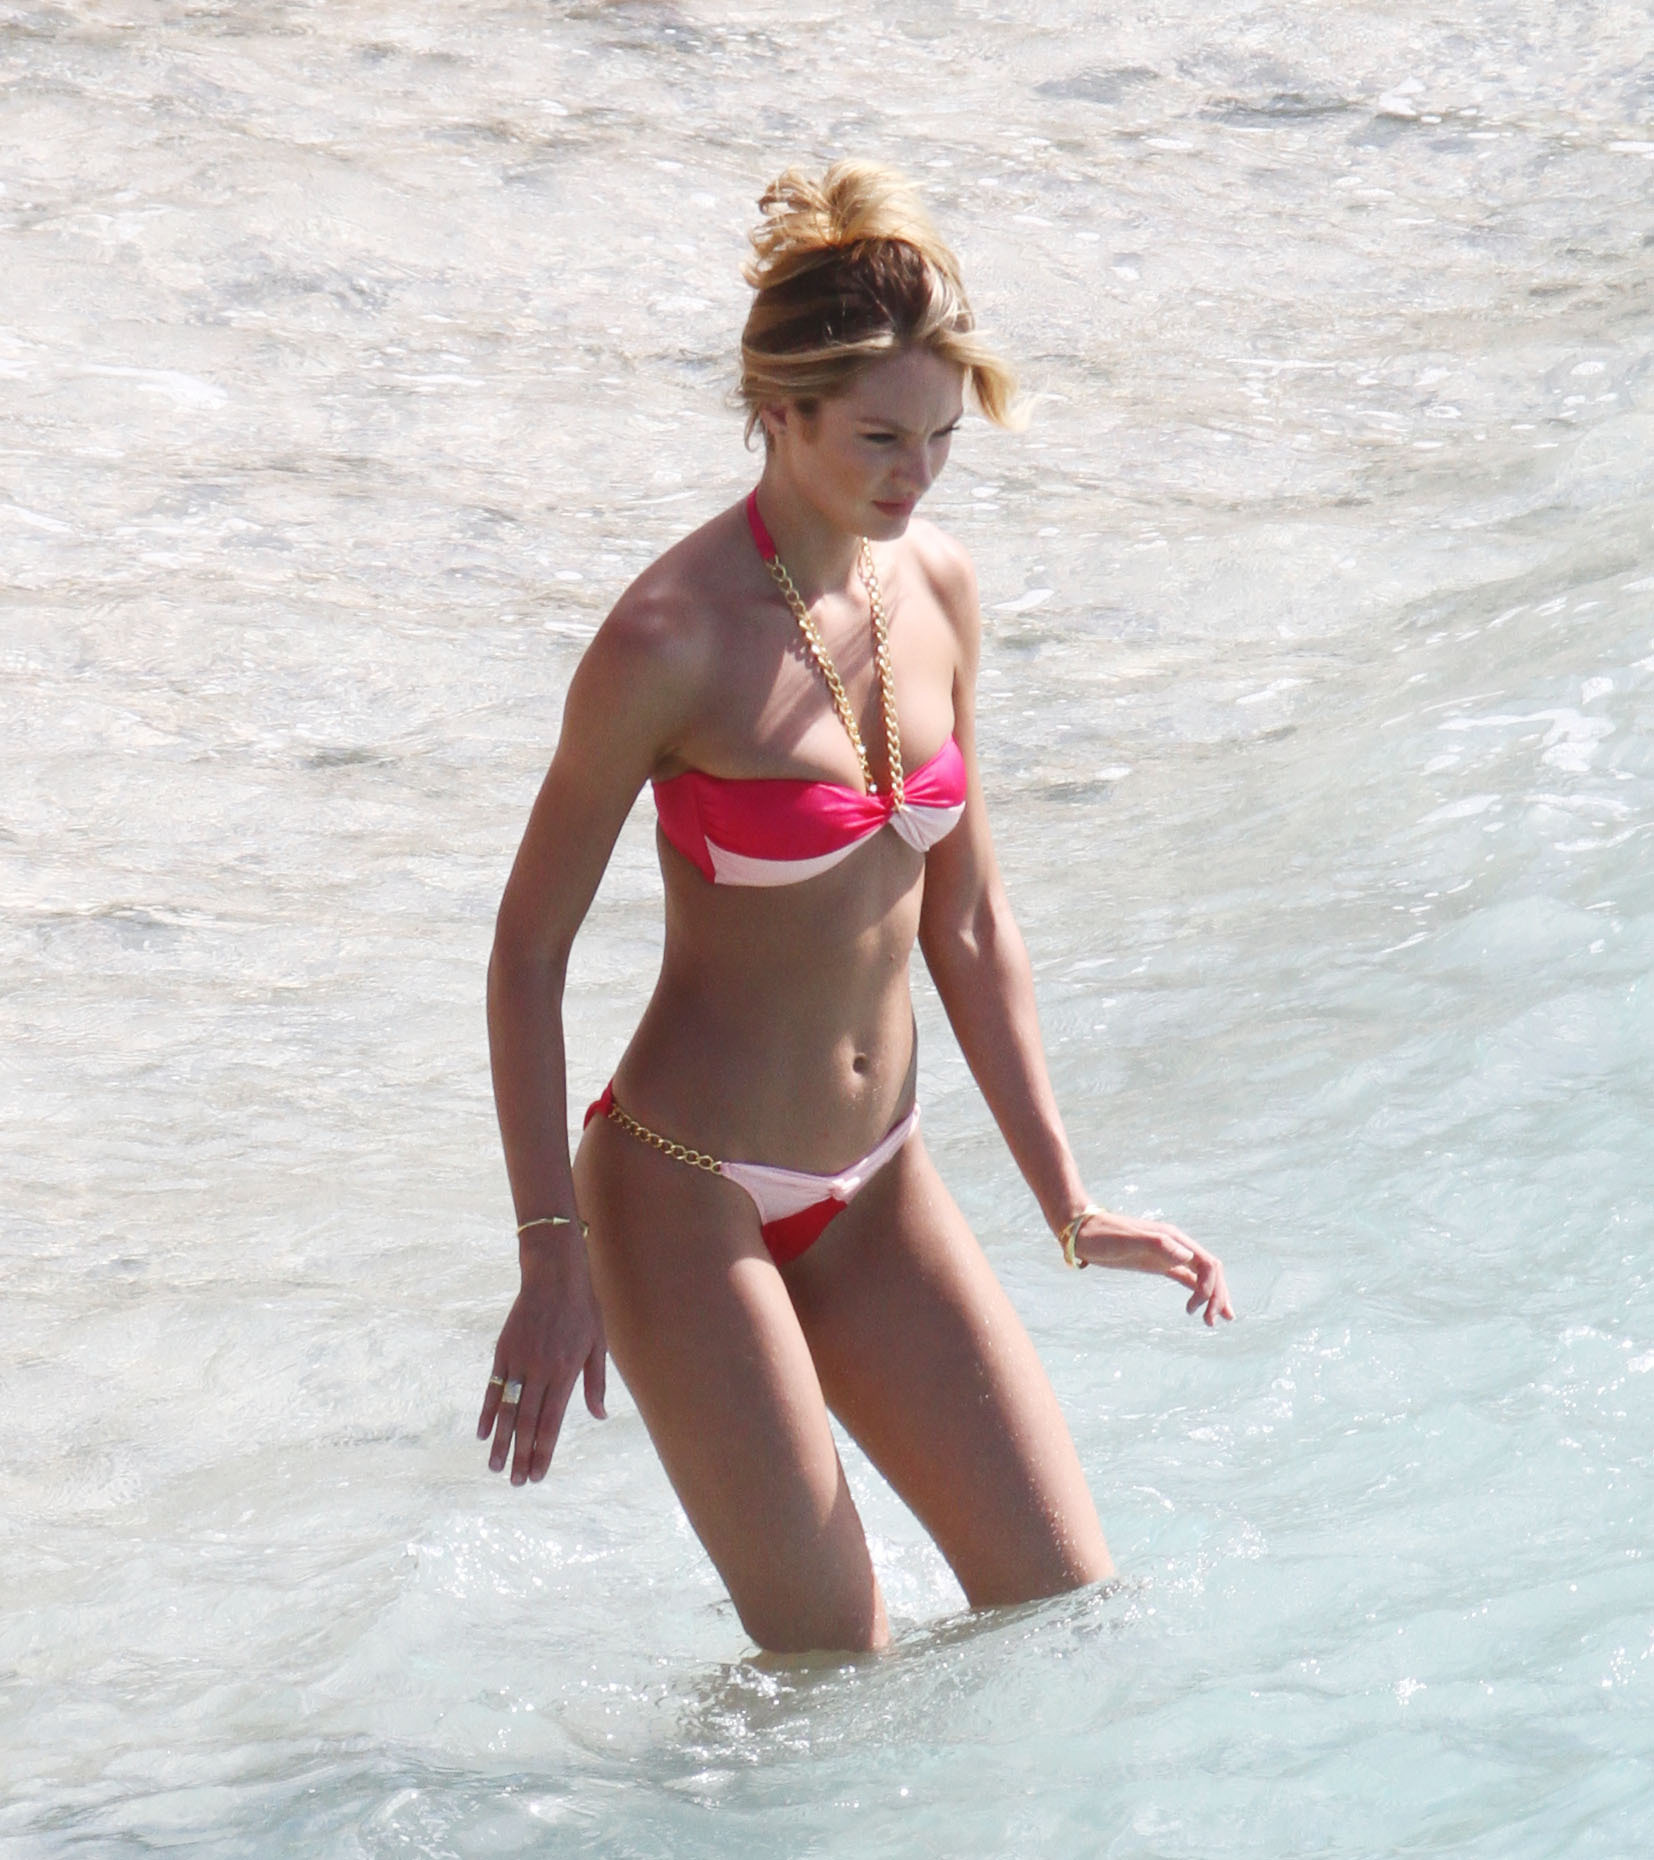 Candice Swanepoel pink and white bikini